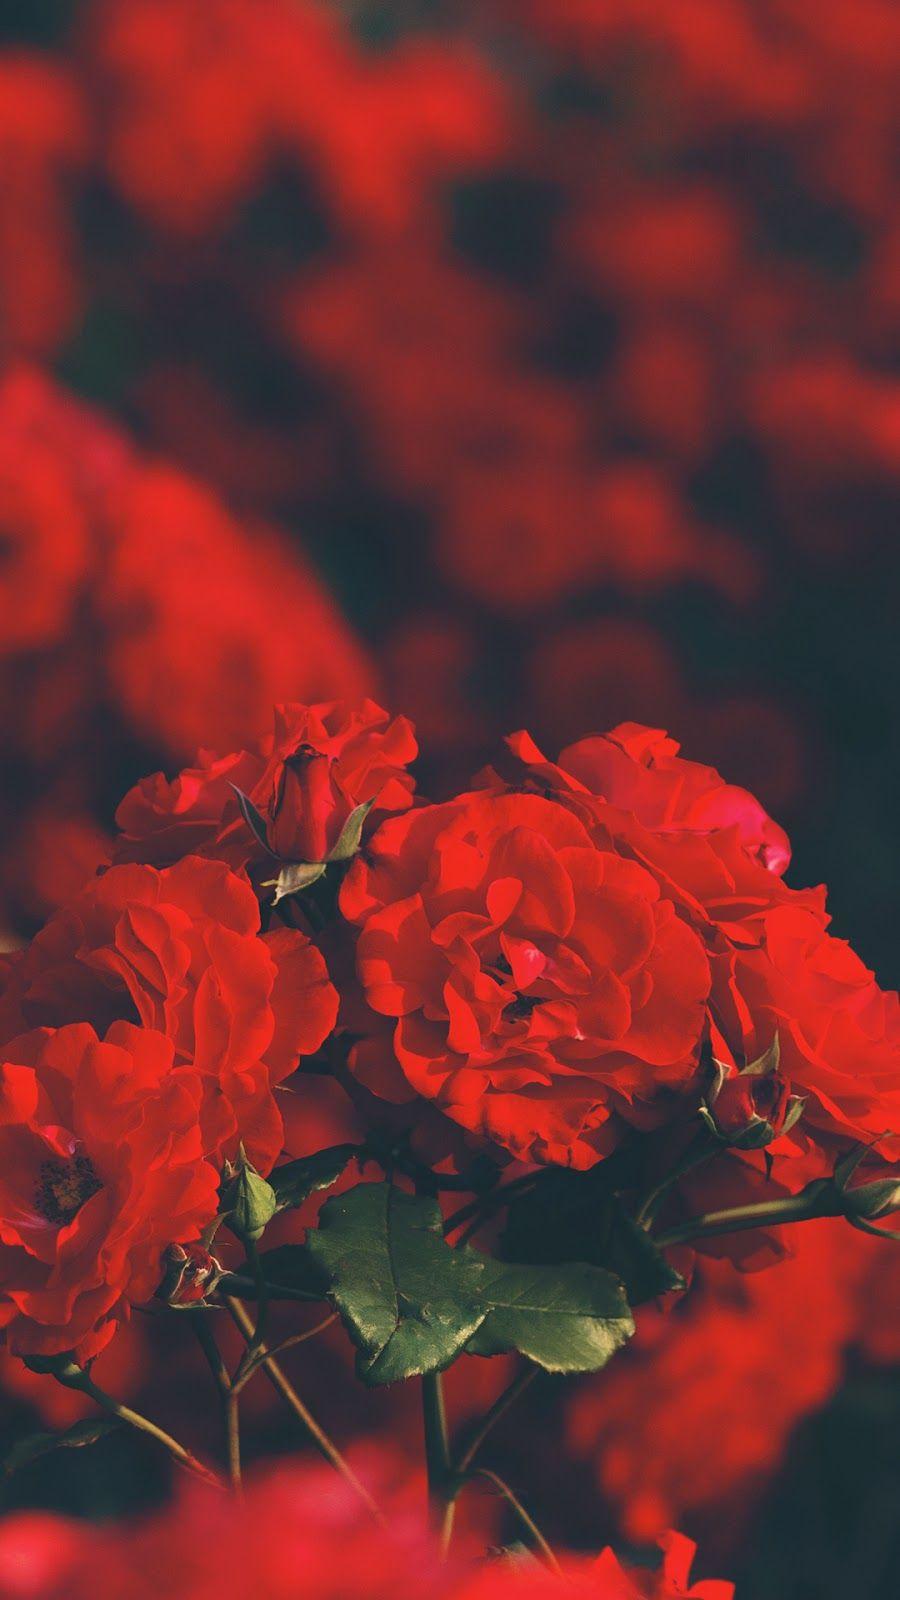 Red Rose Wallpaper Wallpaper Iphone Android Background Followme Rose Wallpaper Red Wallpaper Red Roses Wallpaper